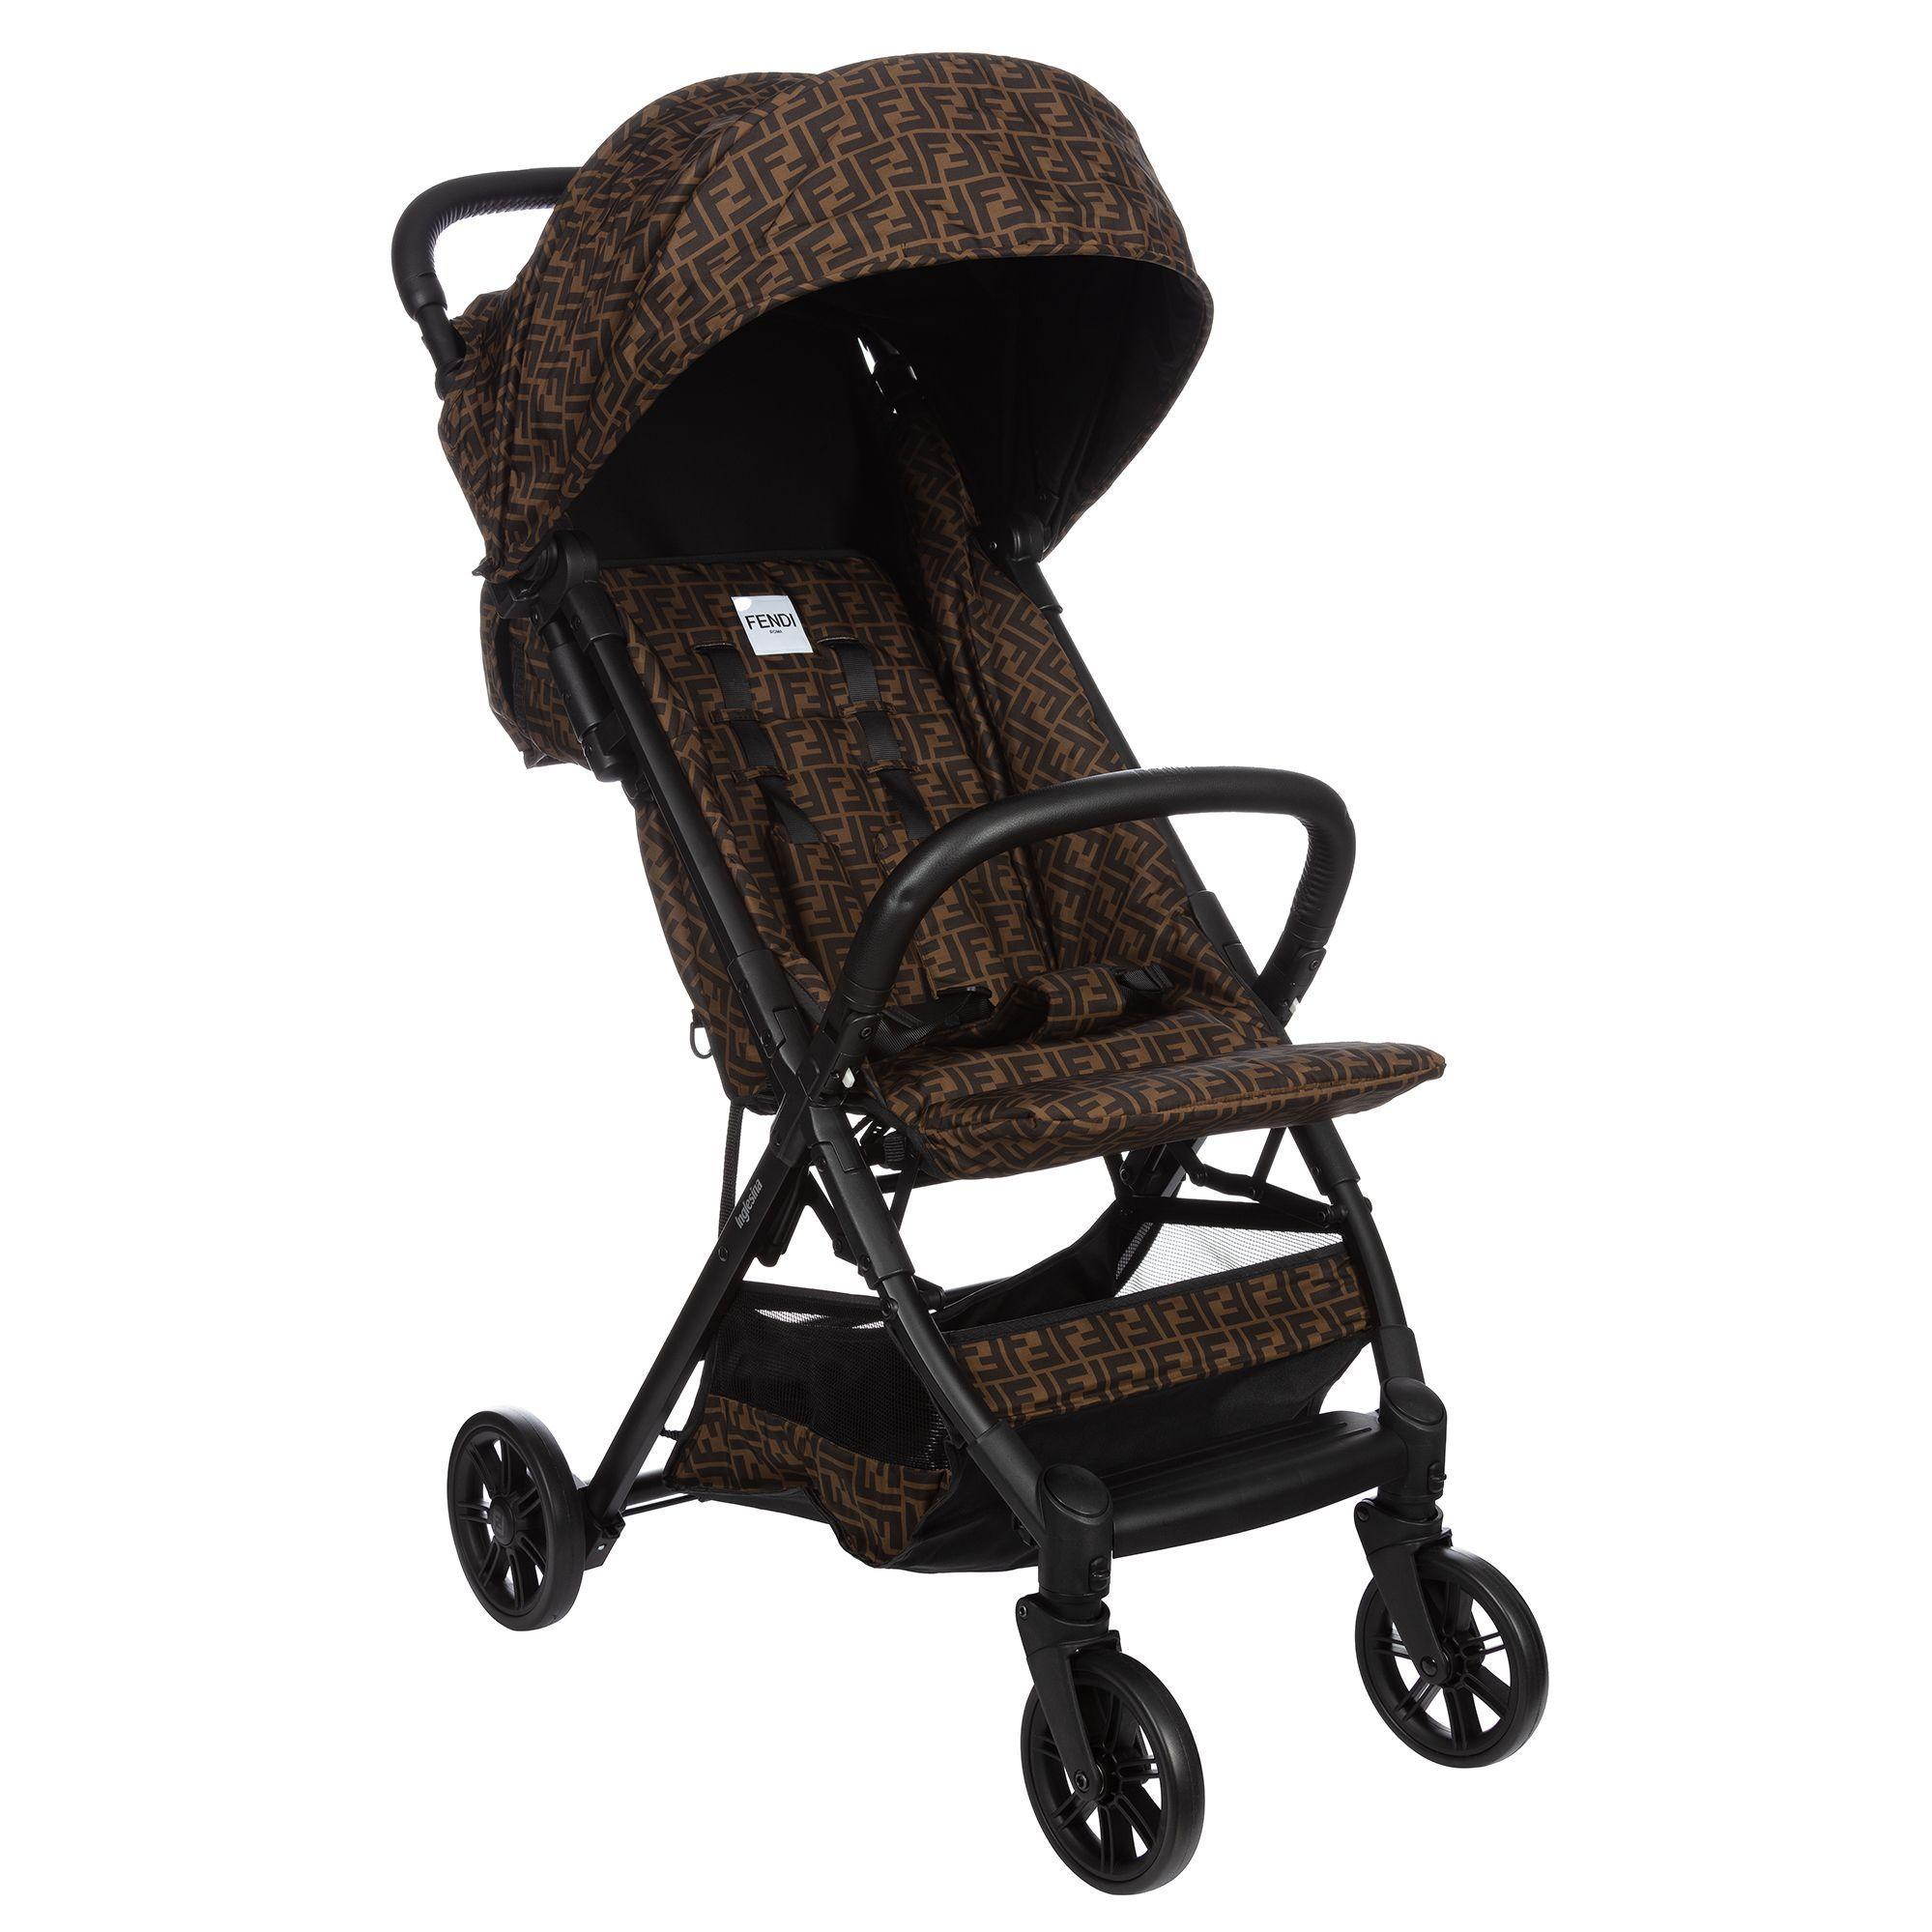 Picture of Fendi BUV020 baby accessory brown